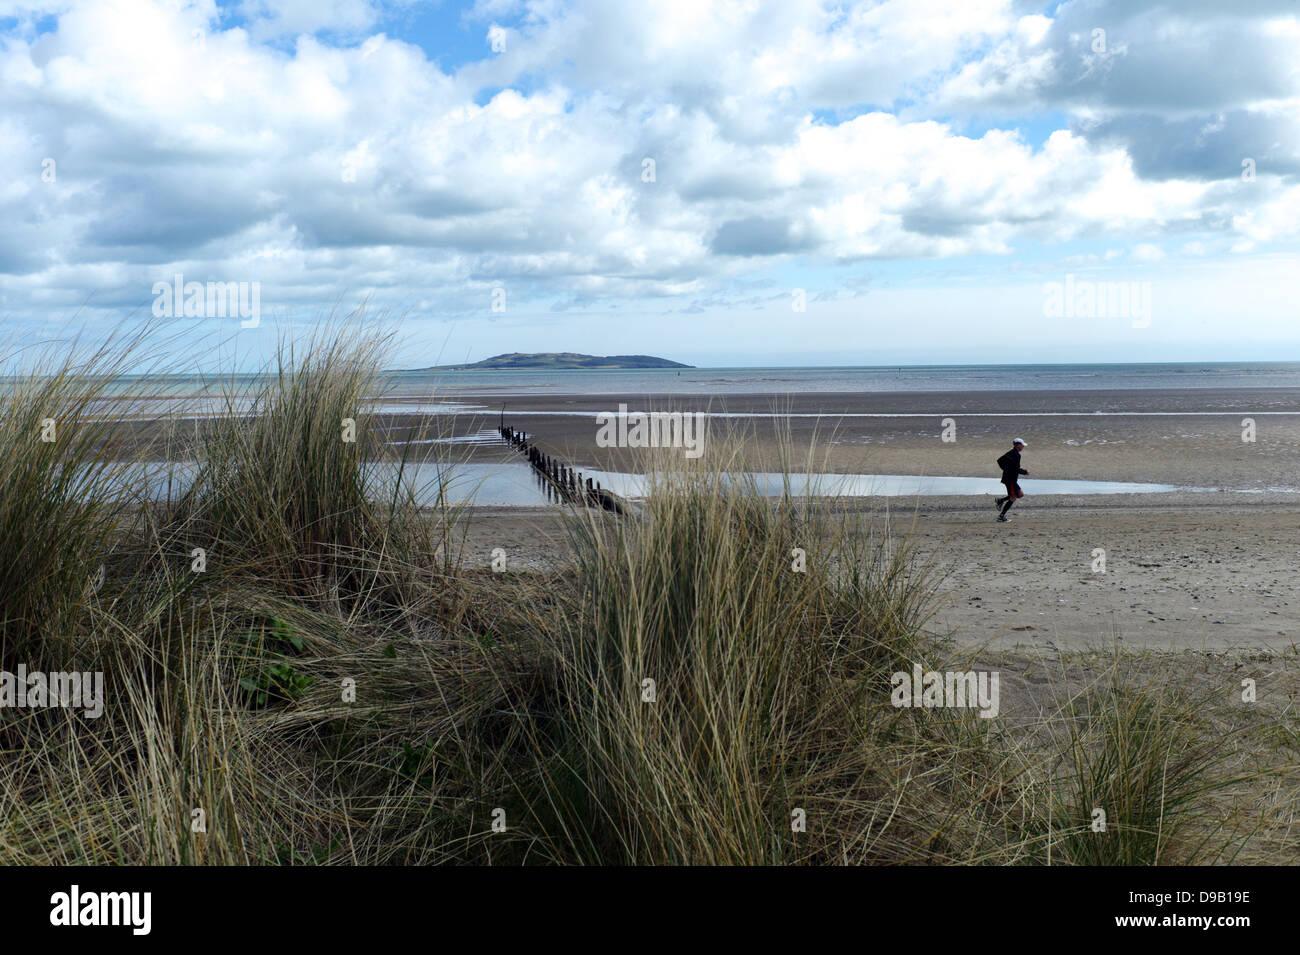 Jogging on the beach at MALAHIDE in DUBLIN opposite LAMBAY Island - Stock Image